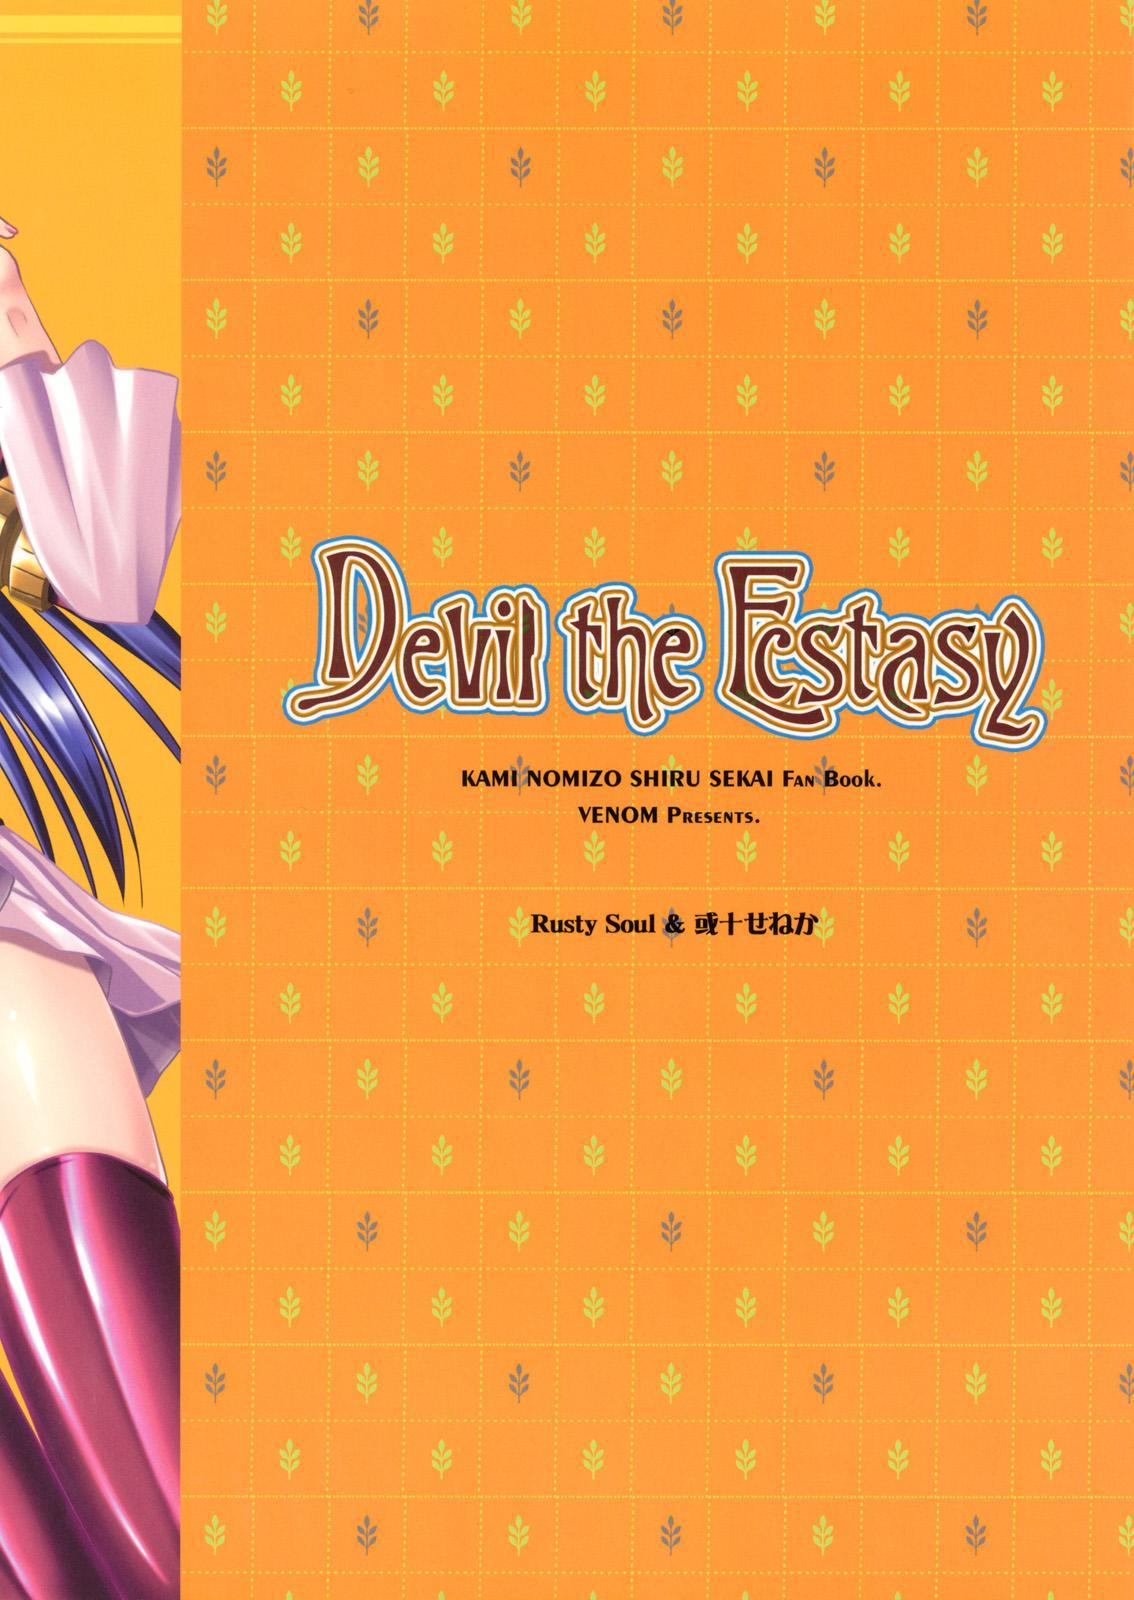 Devil the Ecstasy 25